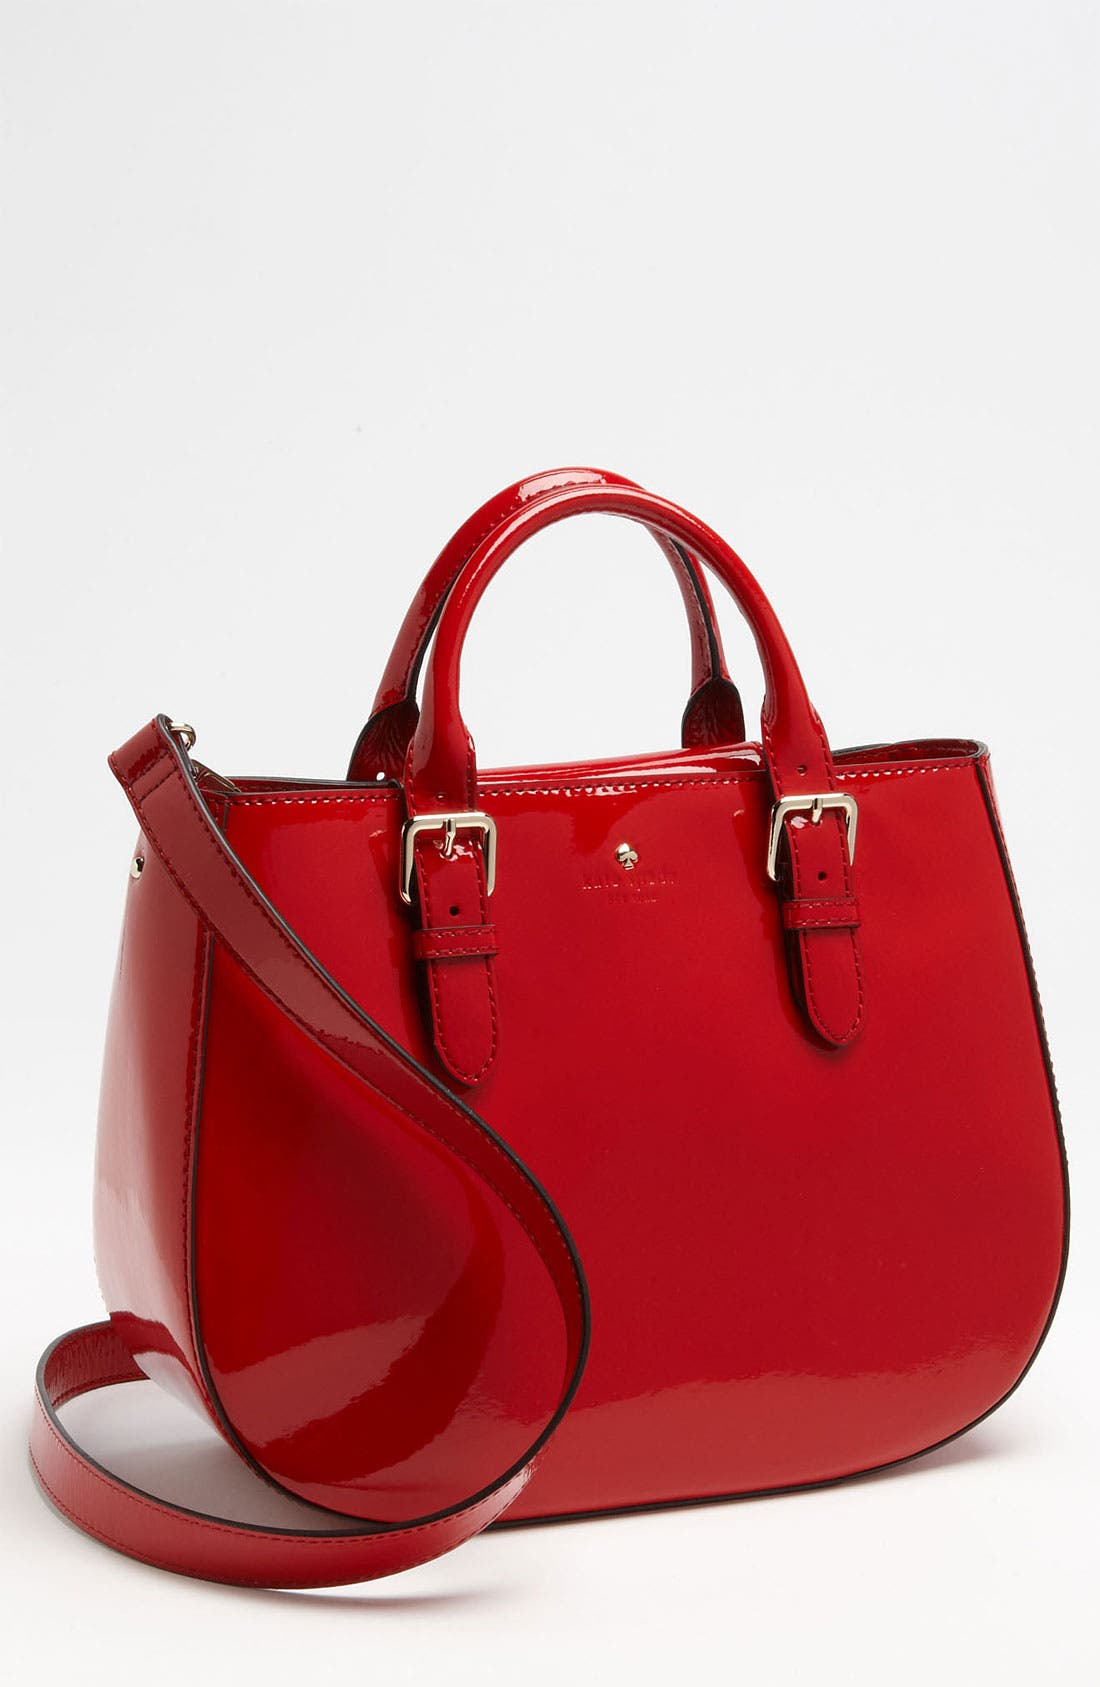 Alternate Image 1 Selected - kate spade new york 'carlisle street - sylvie' handbag